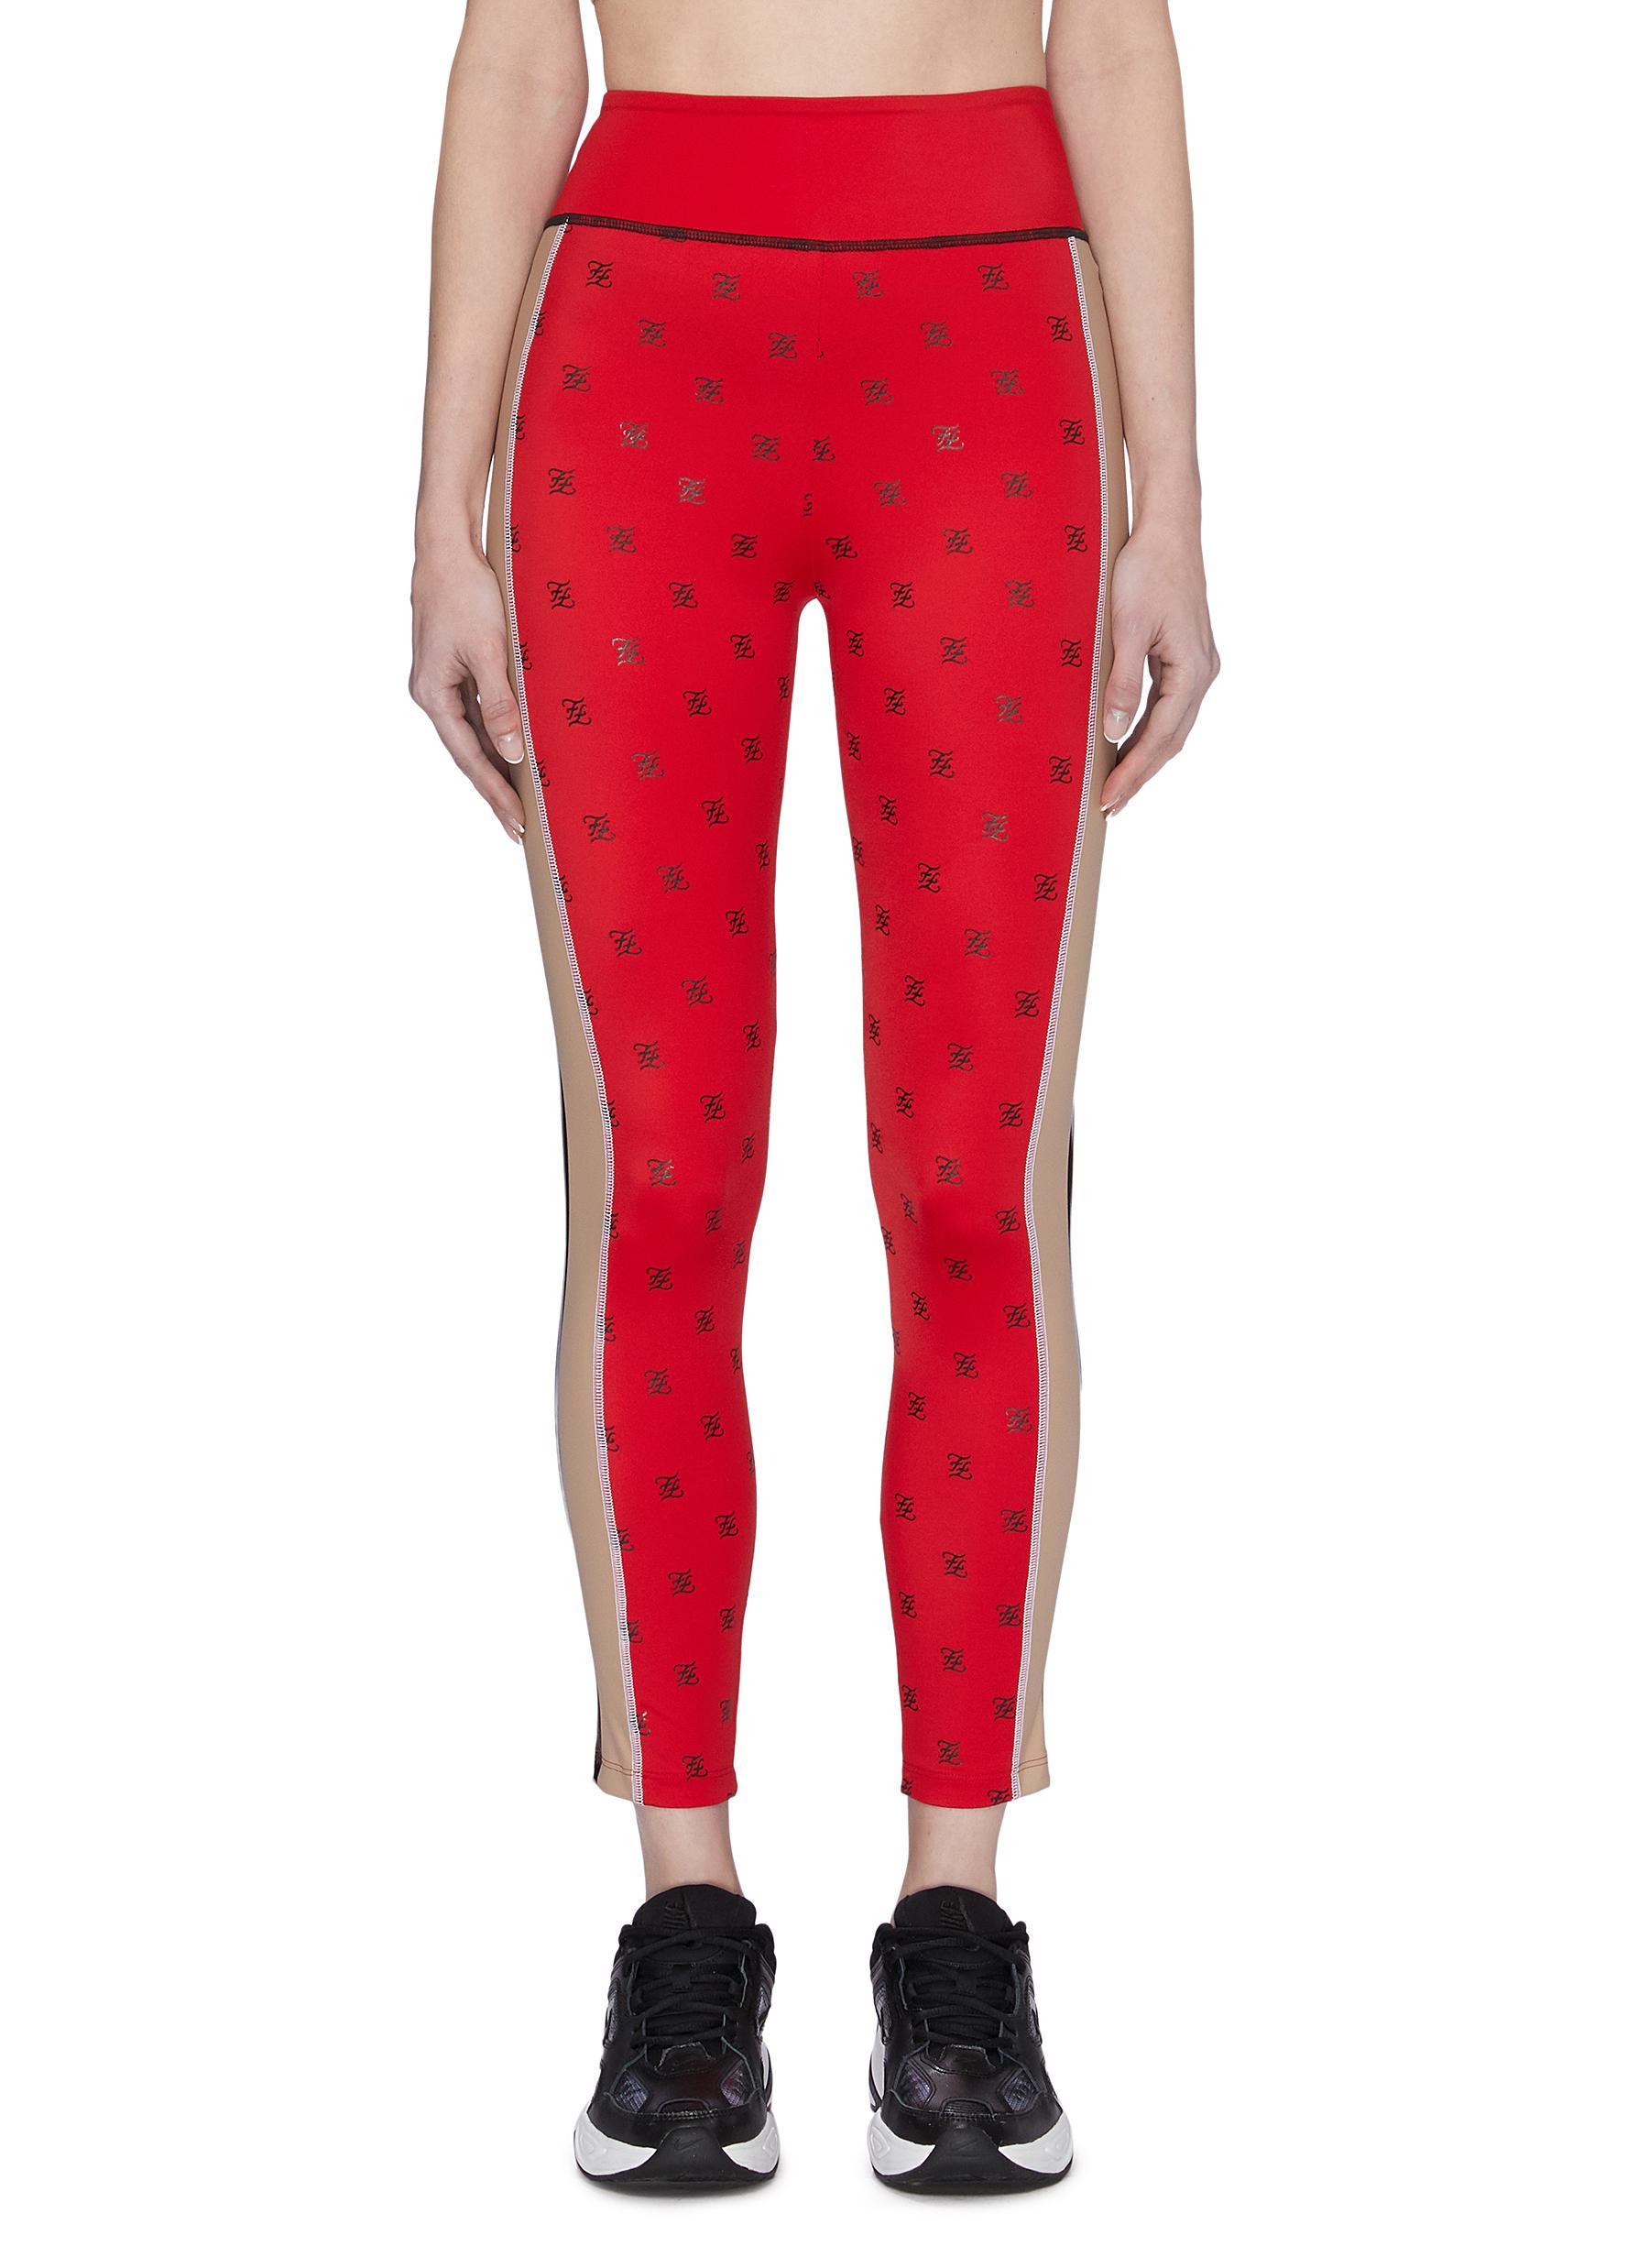 Buy Fendi Sport Pants & Shorts 'Karligraphy' logo print leggings